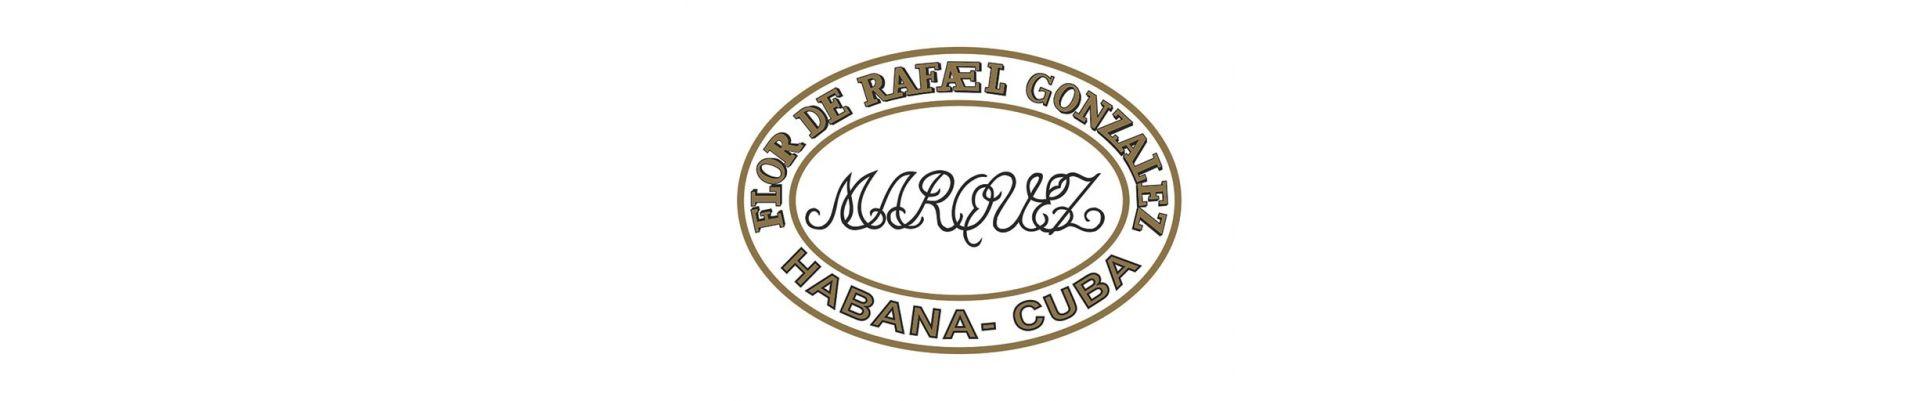 Trabucuri Rafael Gonzales Marquez trabucuri cubaneze.Magazin trabucuri